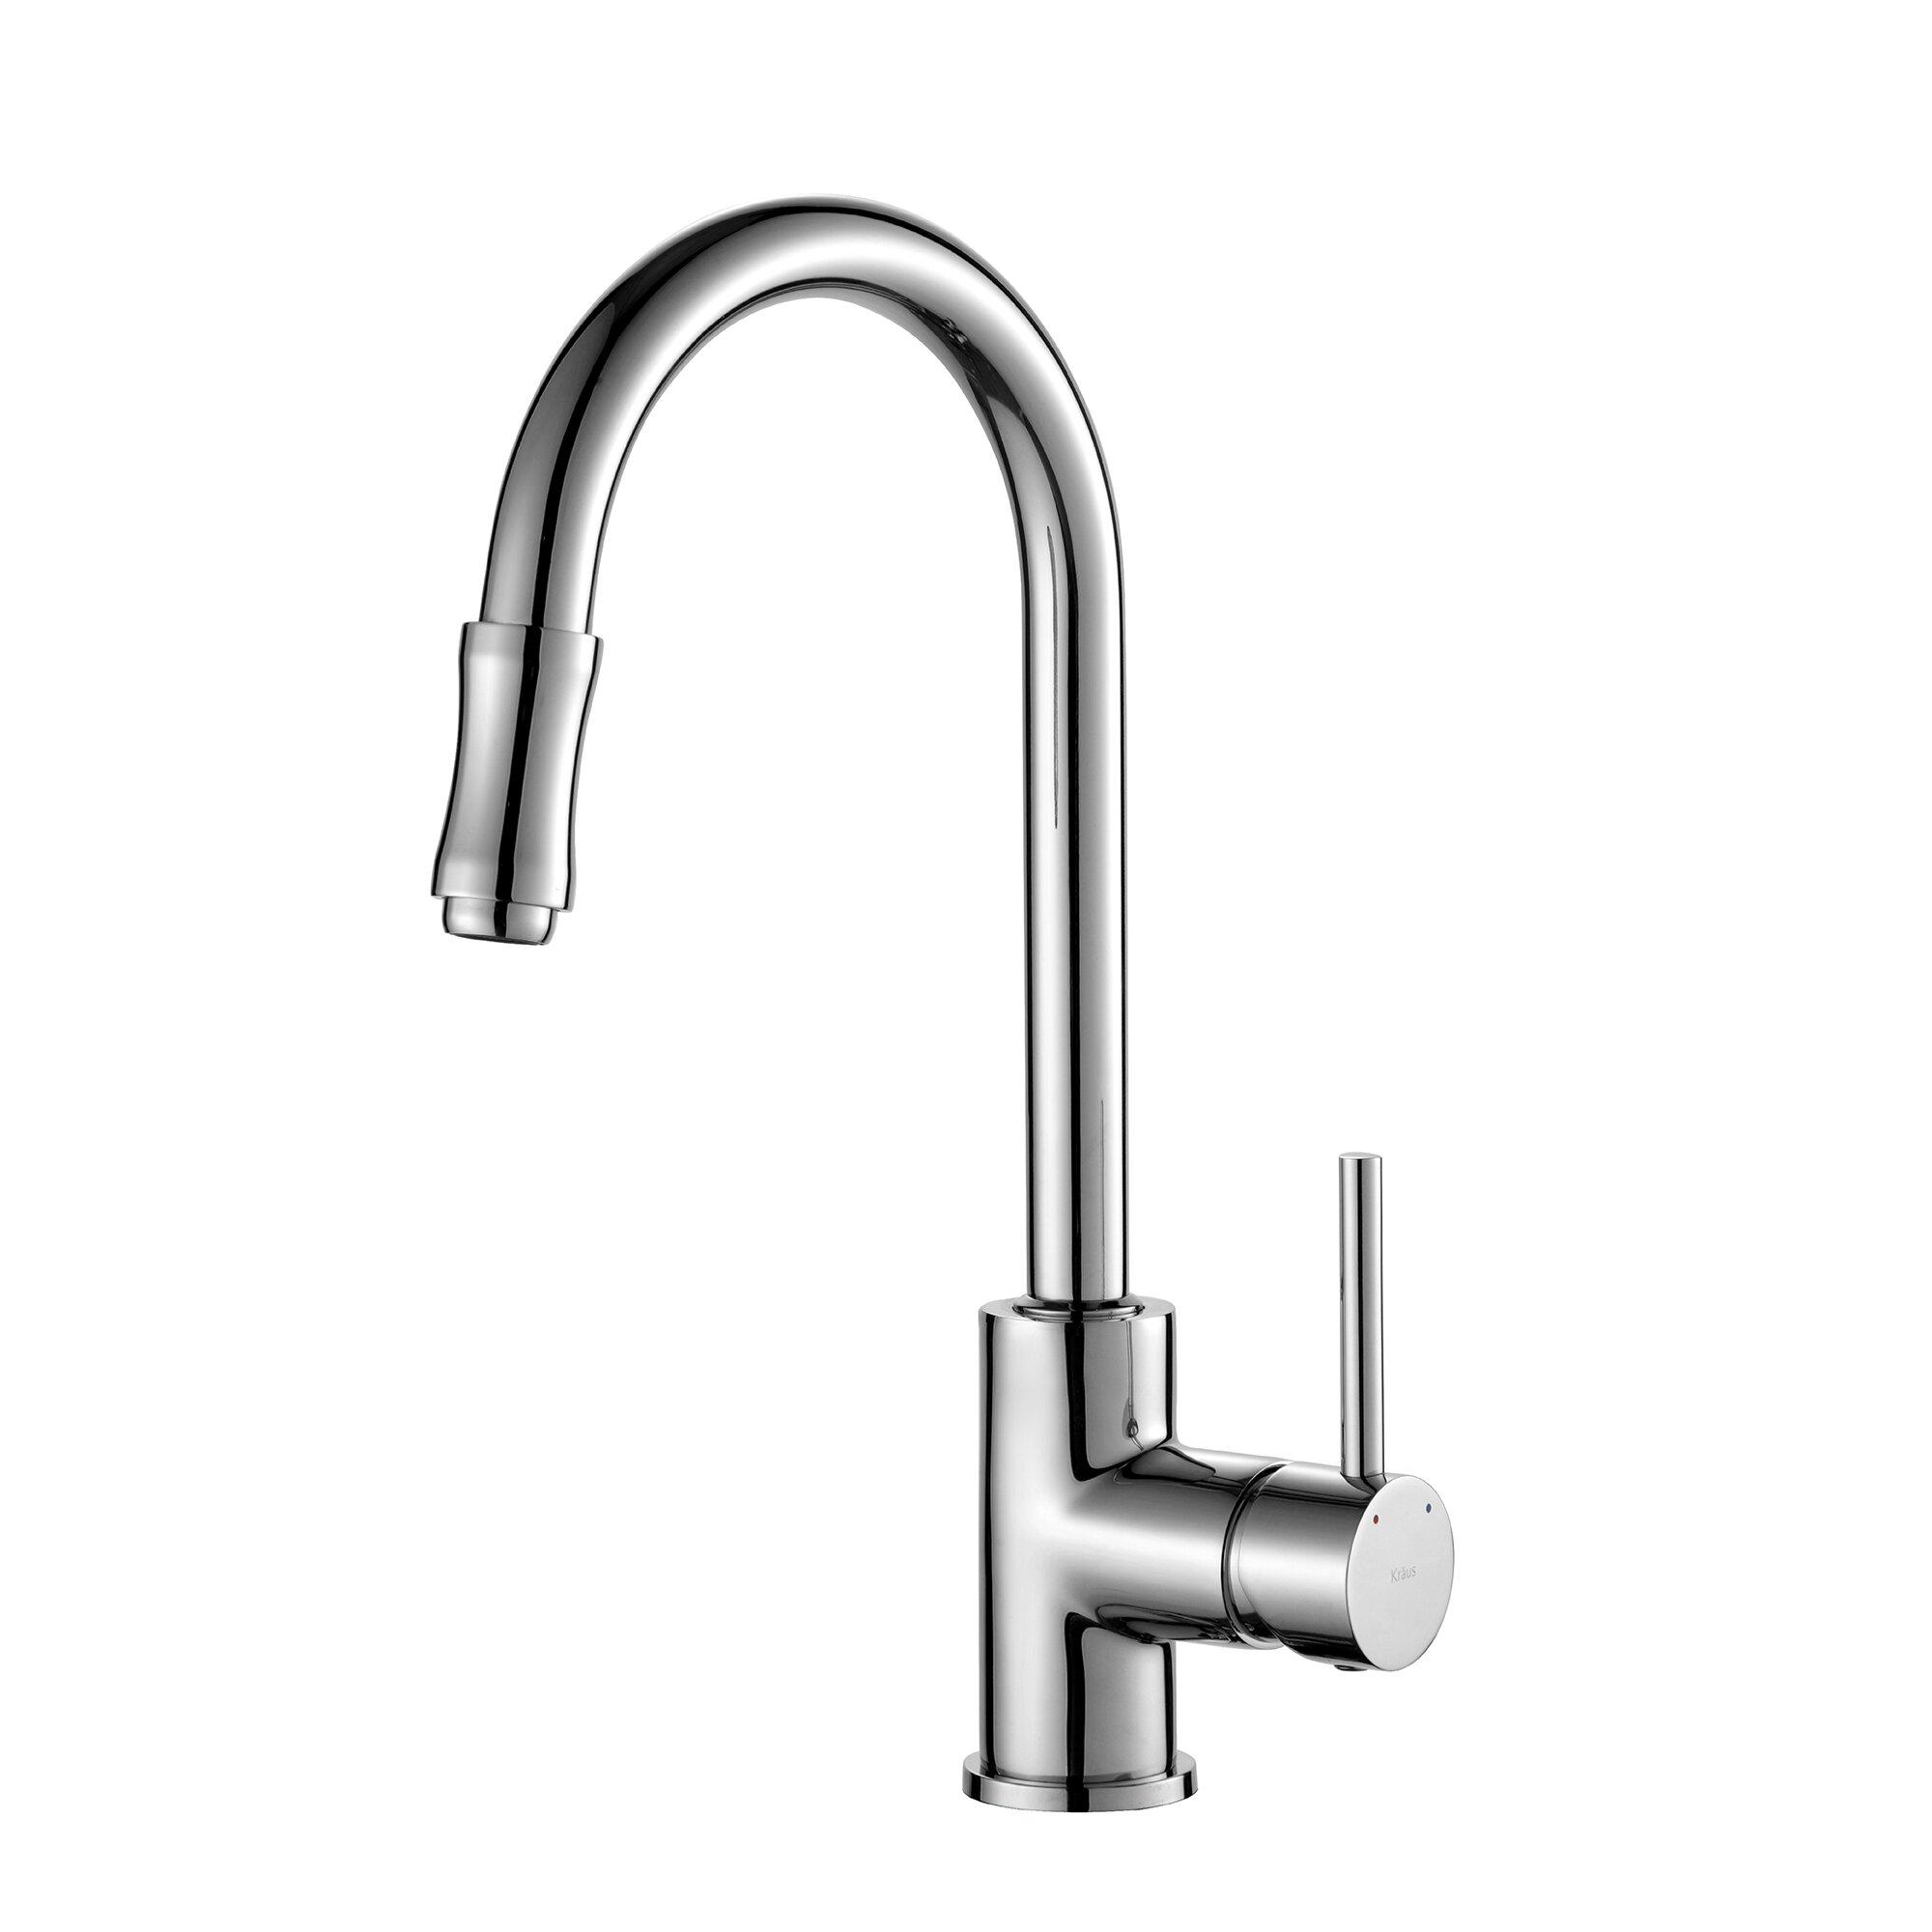 Kraus Faucets Reviews : Kraus Single Handle Deck-Mounted Kitchen Sink Faucet & Reviews ...